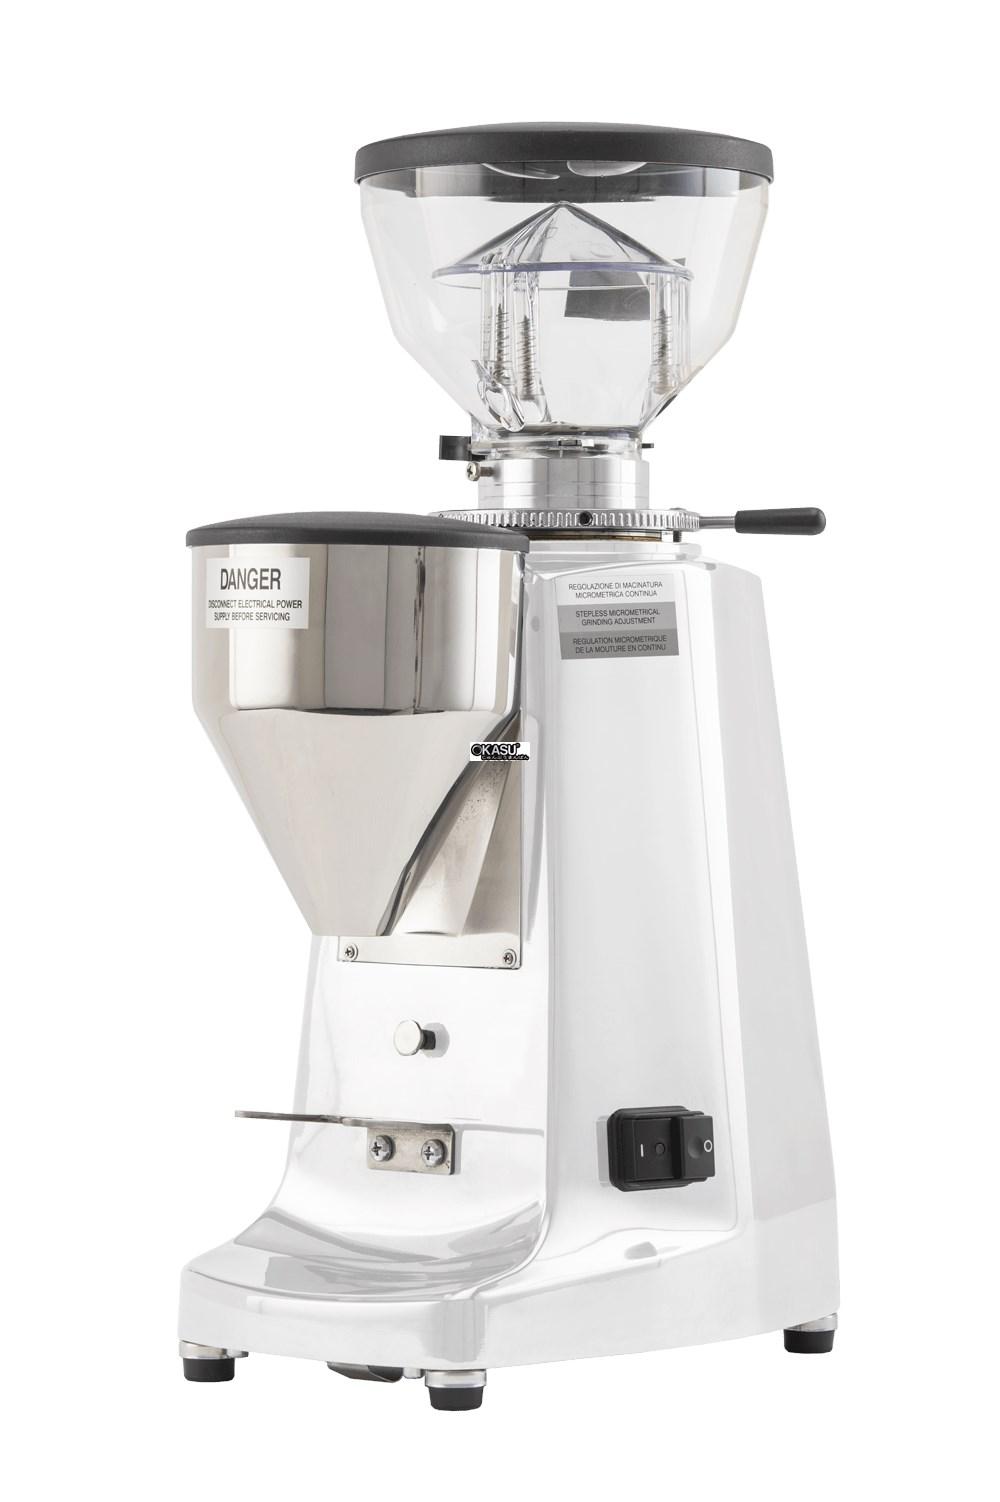 Máy xay cà phê La Marzocco Lux D by Mazzer